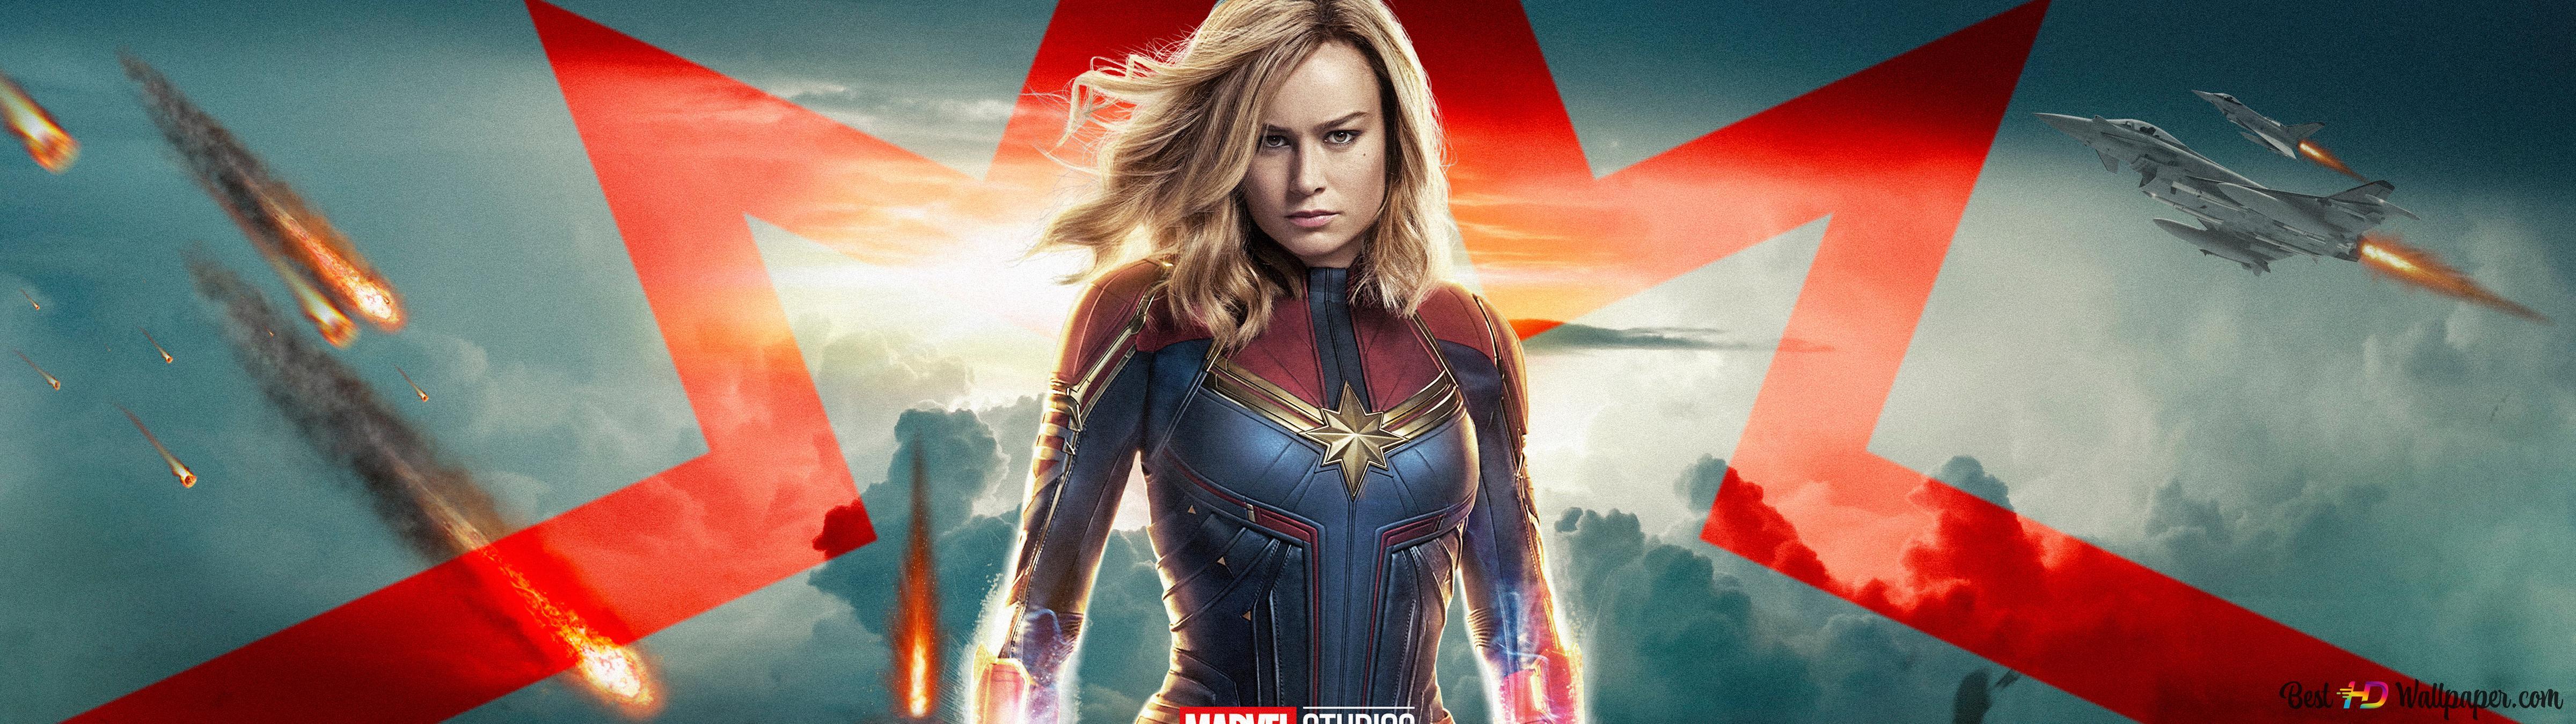 Marvel Studios Captain Marvel Hd Wallpaper Download